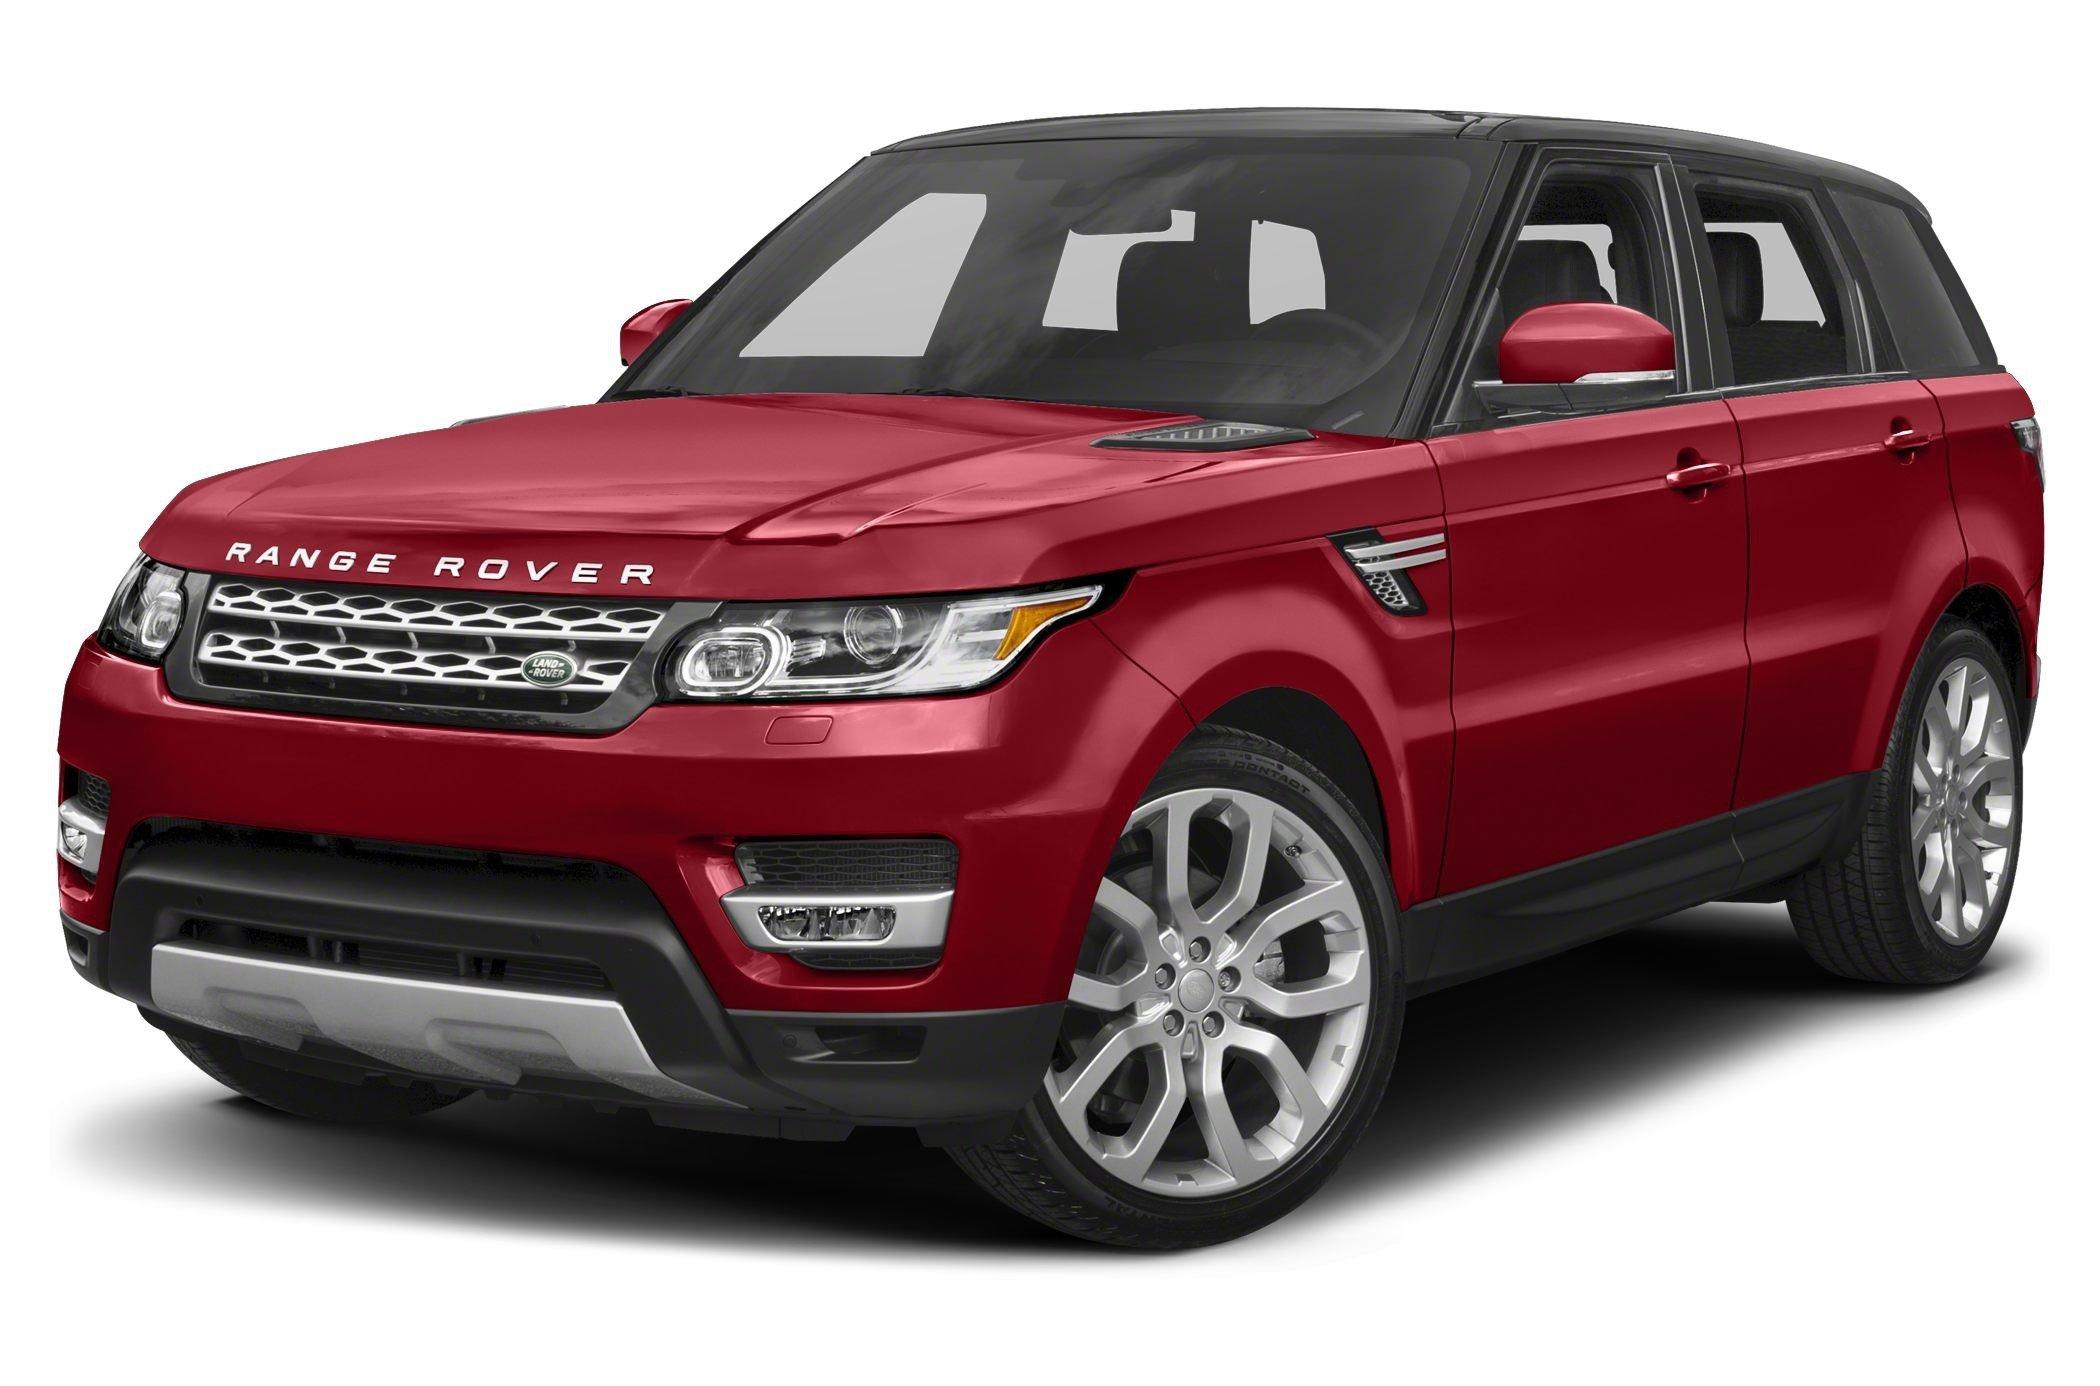 Land Rover Pics